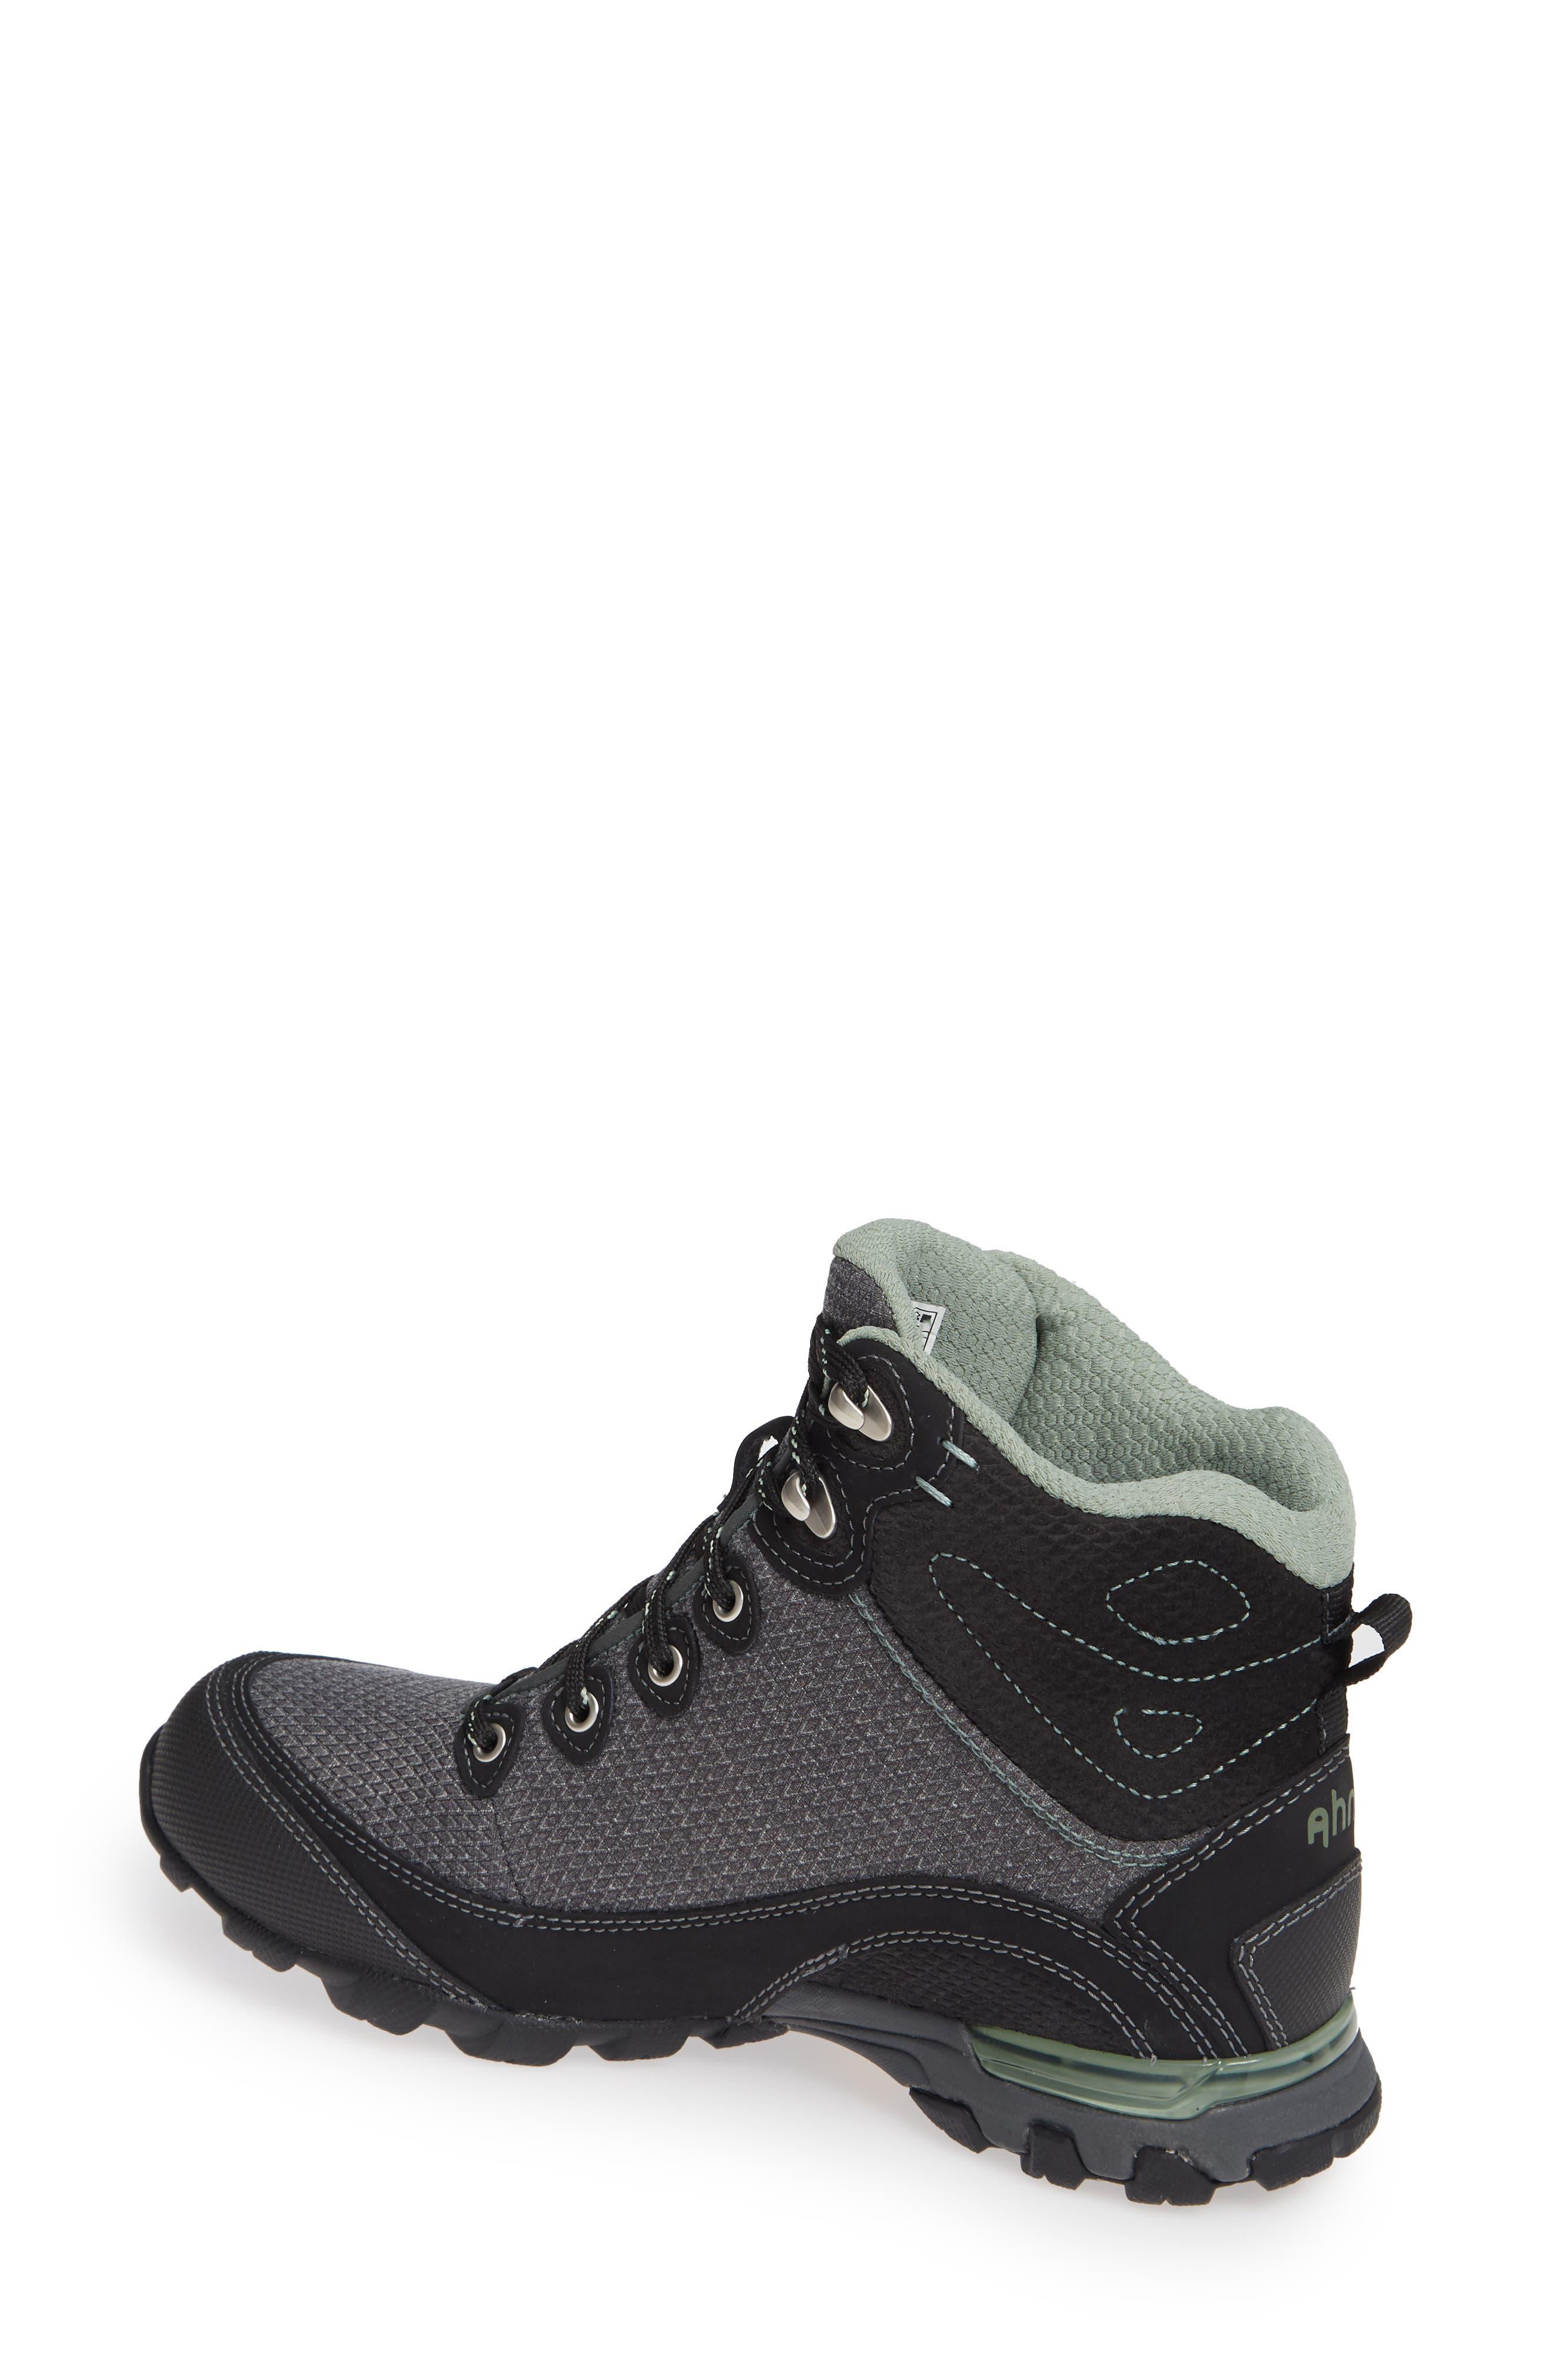 Ahnu by Teva Sugarpine II Waterproof Hiking Boot,                             Alternate thumbnail 2, color,                             BLACK/ GREEN BAY FABRIC